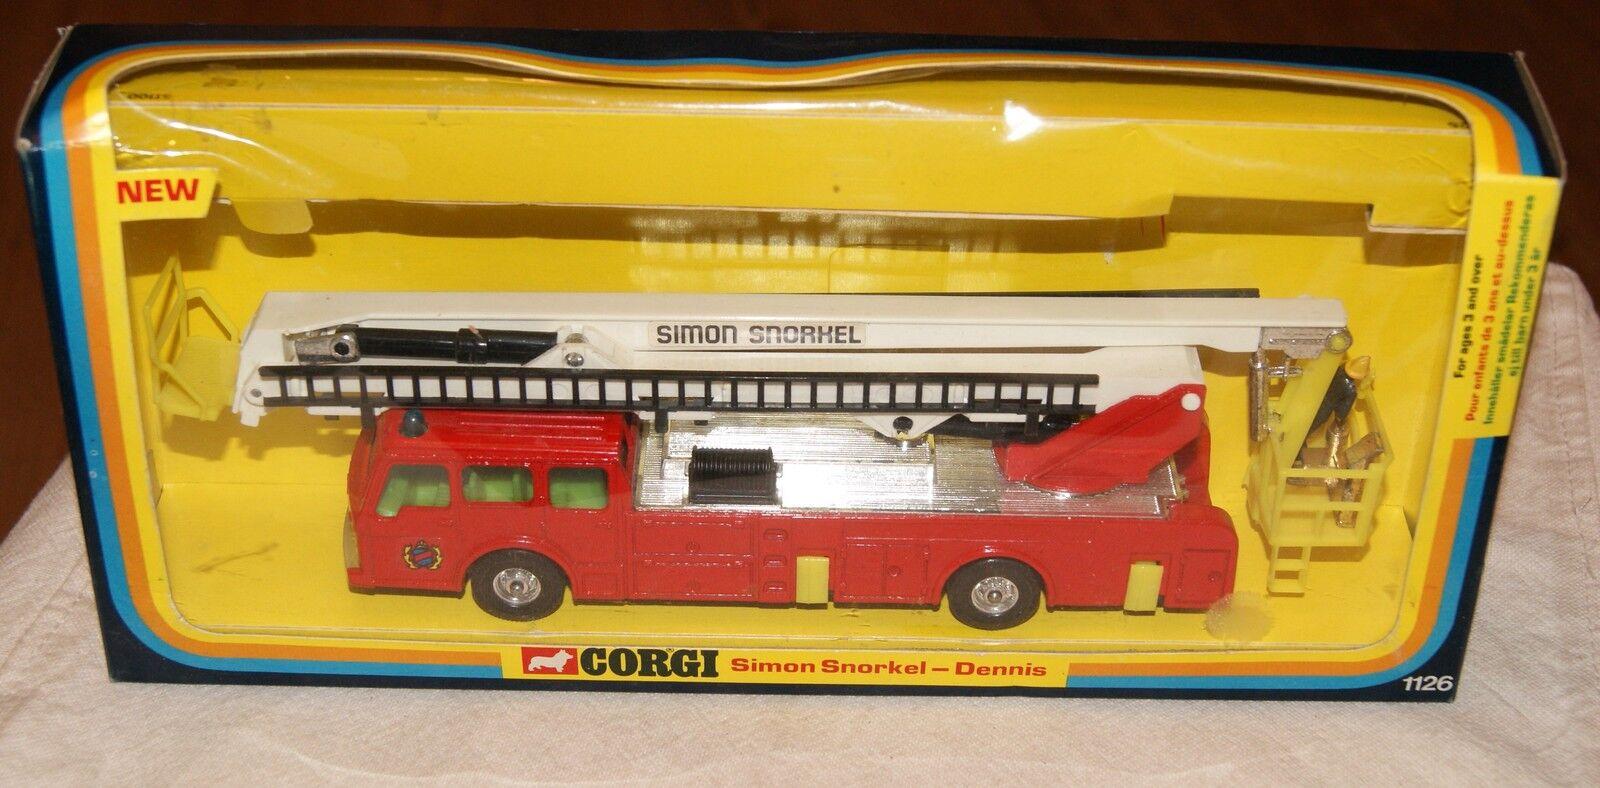 Corgi Modèle 1126 Simon snorkel Dennis 70 s vintage modele 70 s